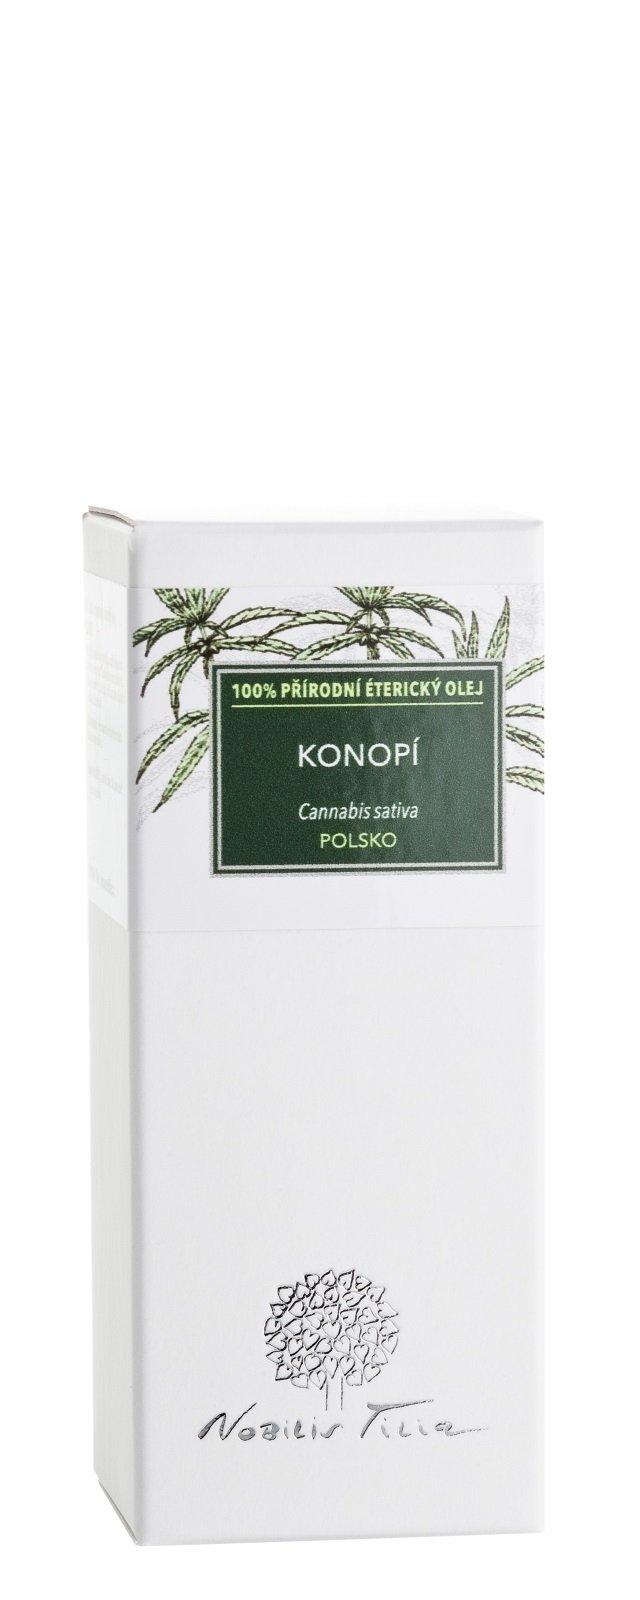 Éterický olej Konopí: 1 ml